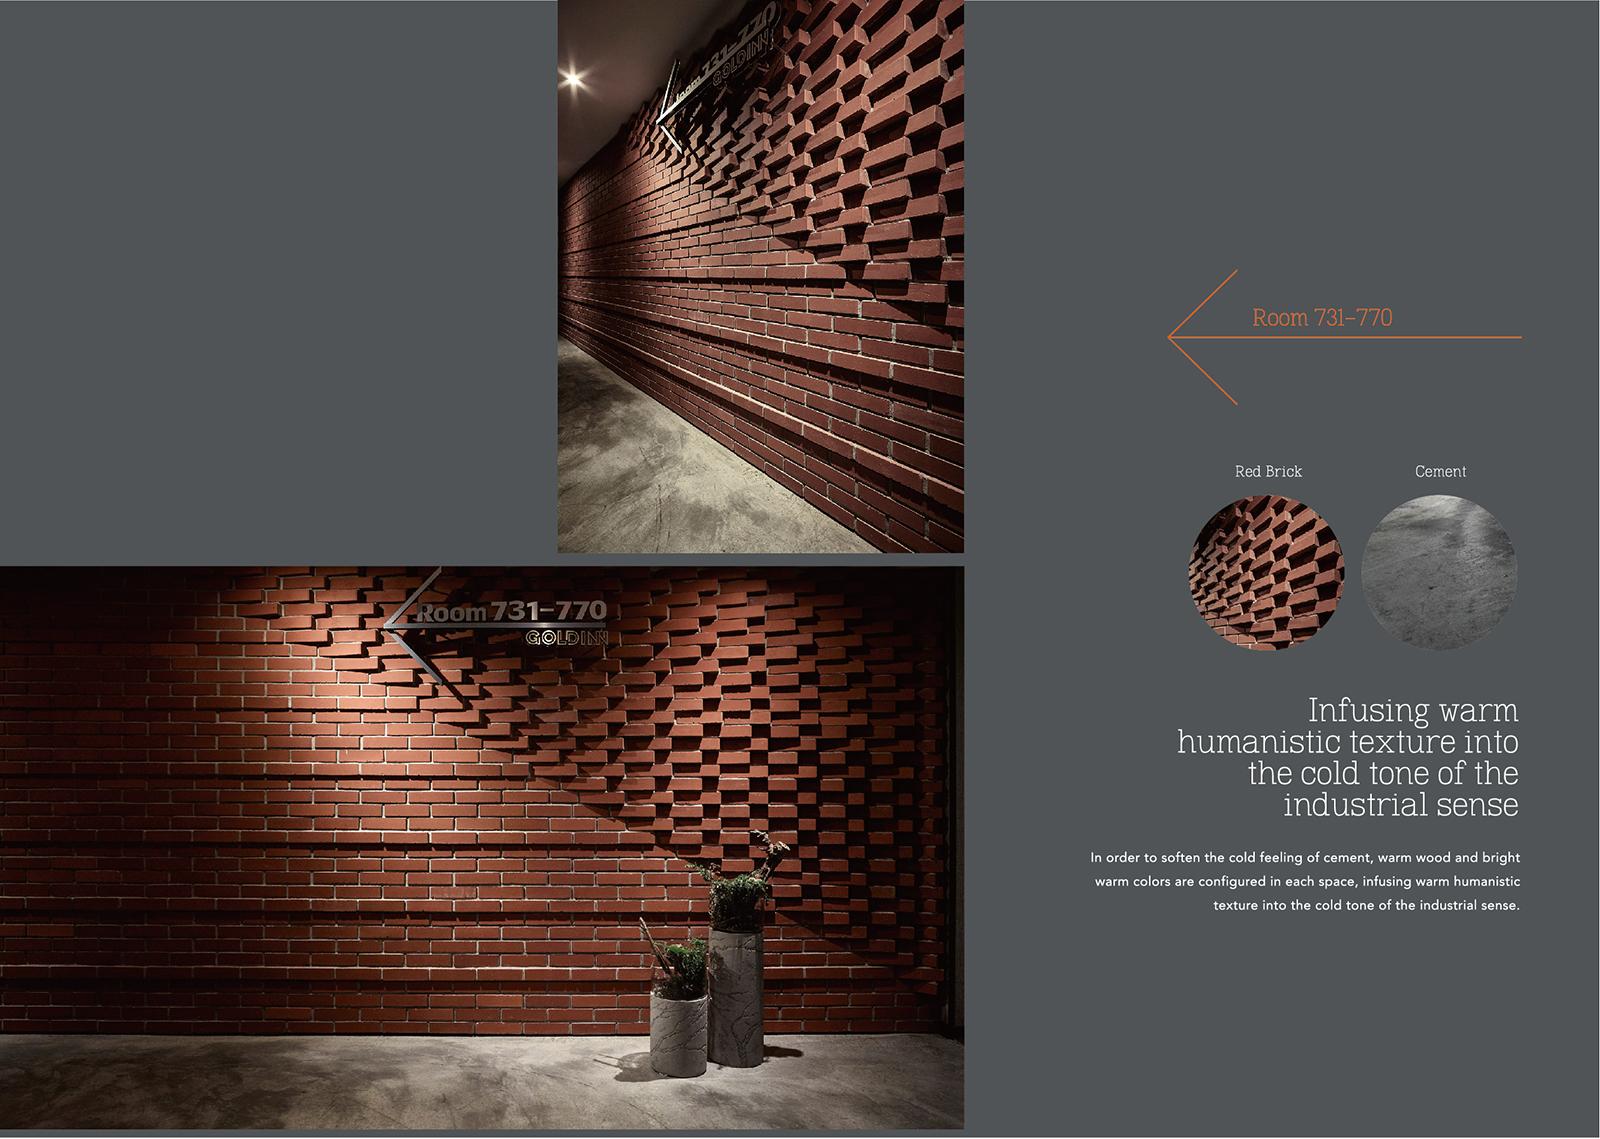 德國 iF Design Award 設計大獎